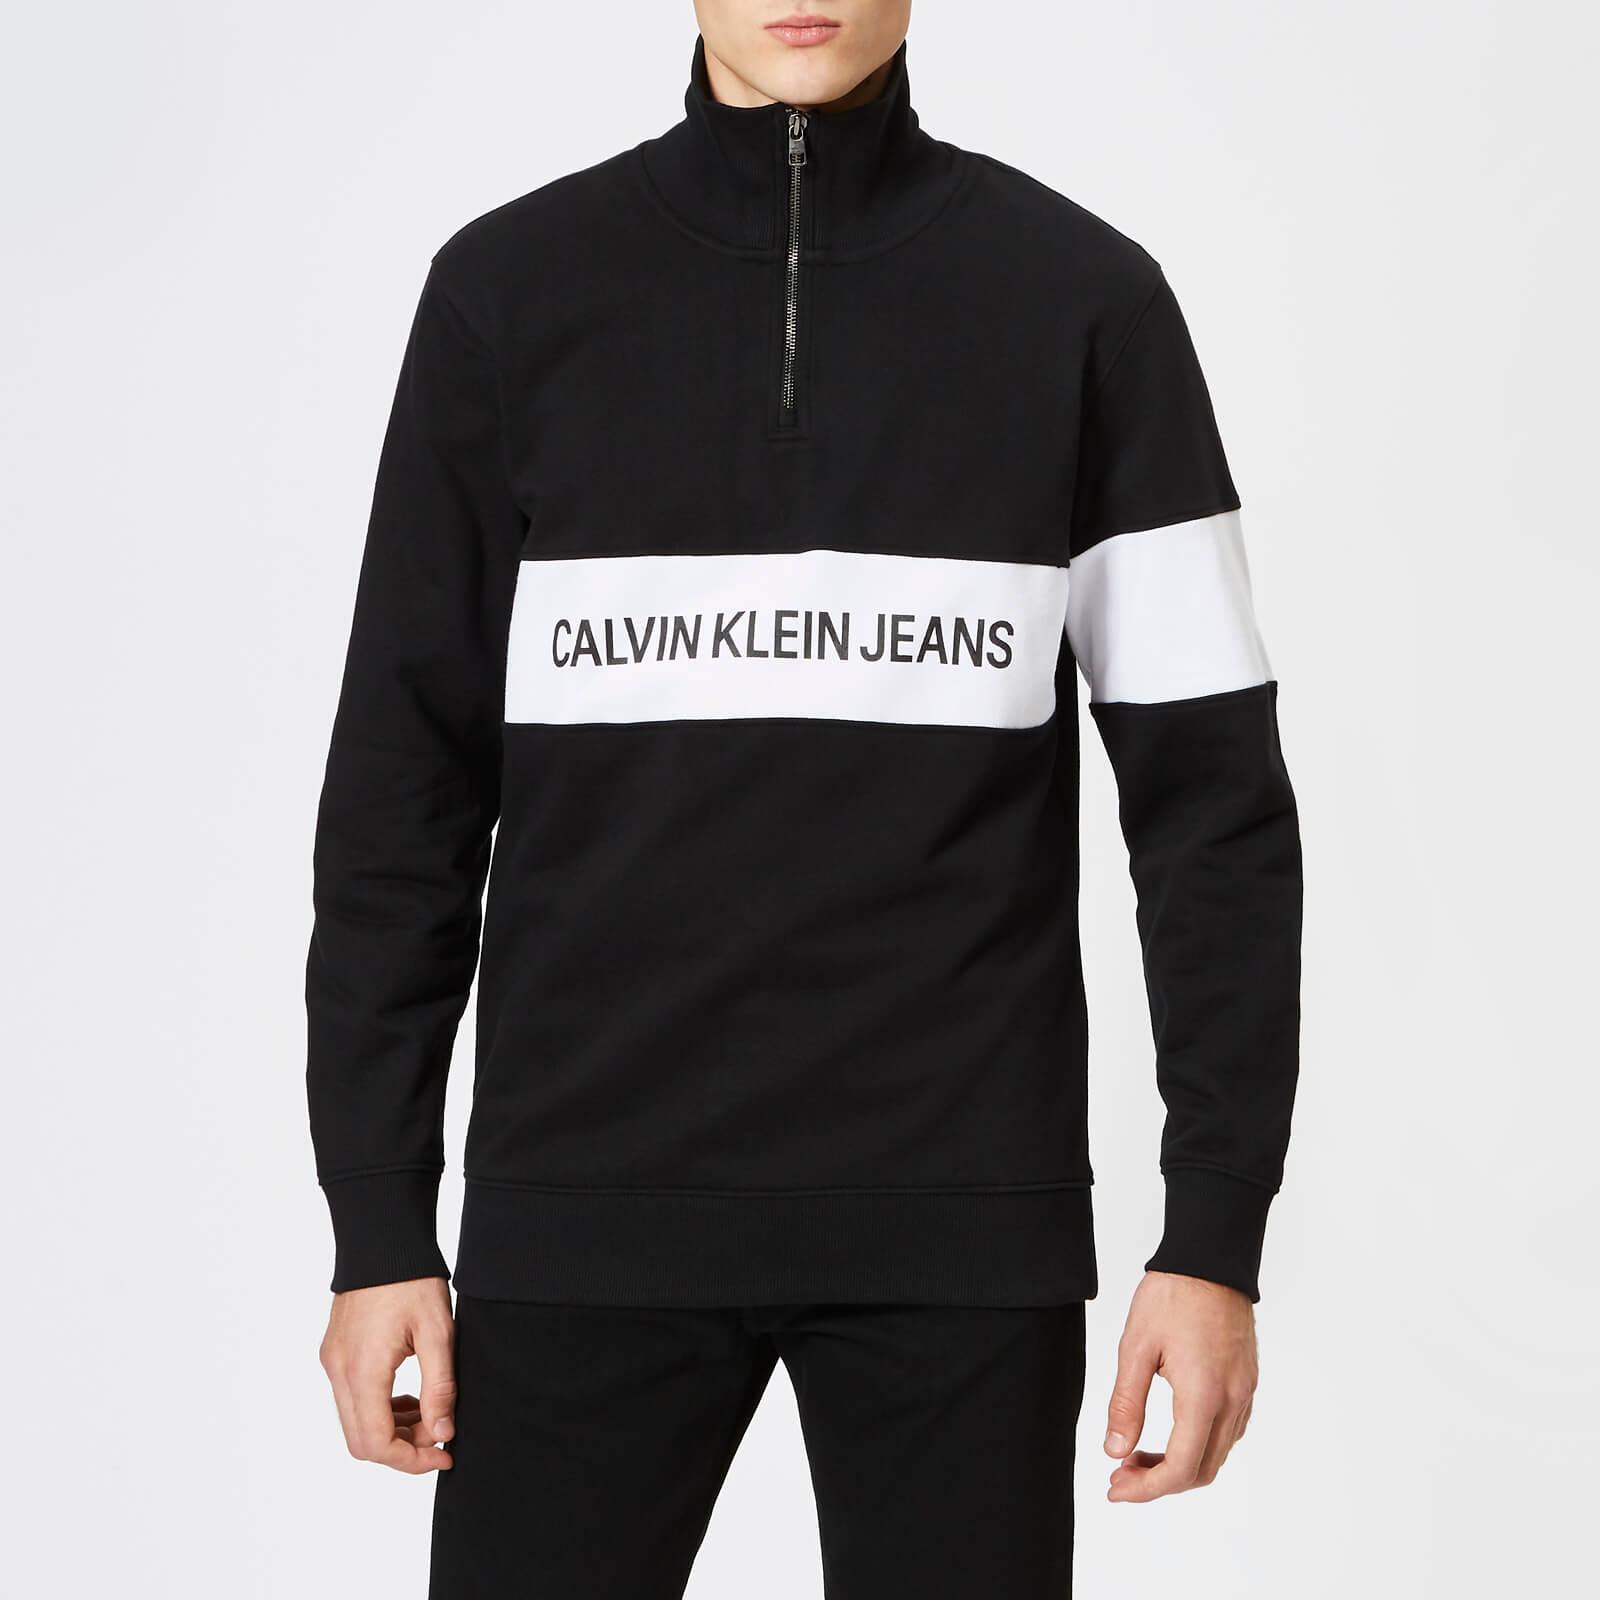 cd9a8d4b2c3 Calvin Klein Jeans Men's Stripe Institutional Logo Half Zip Sweatshirt - CK  Black